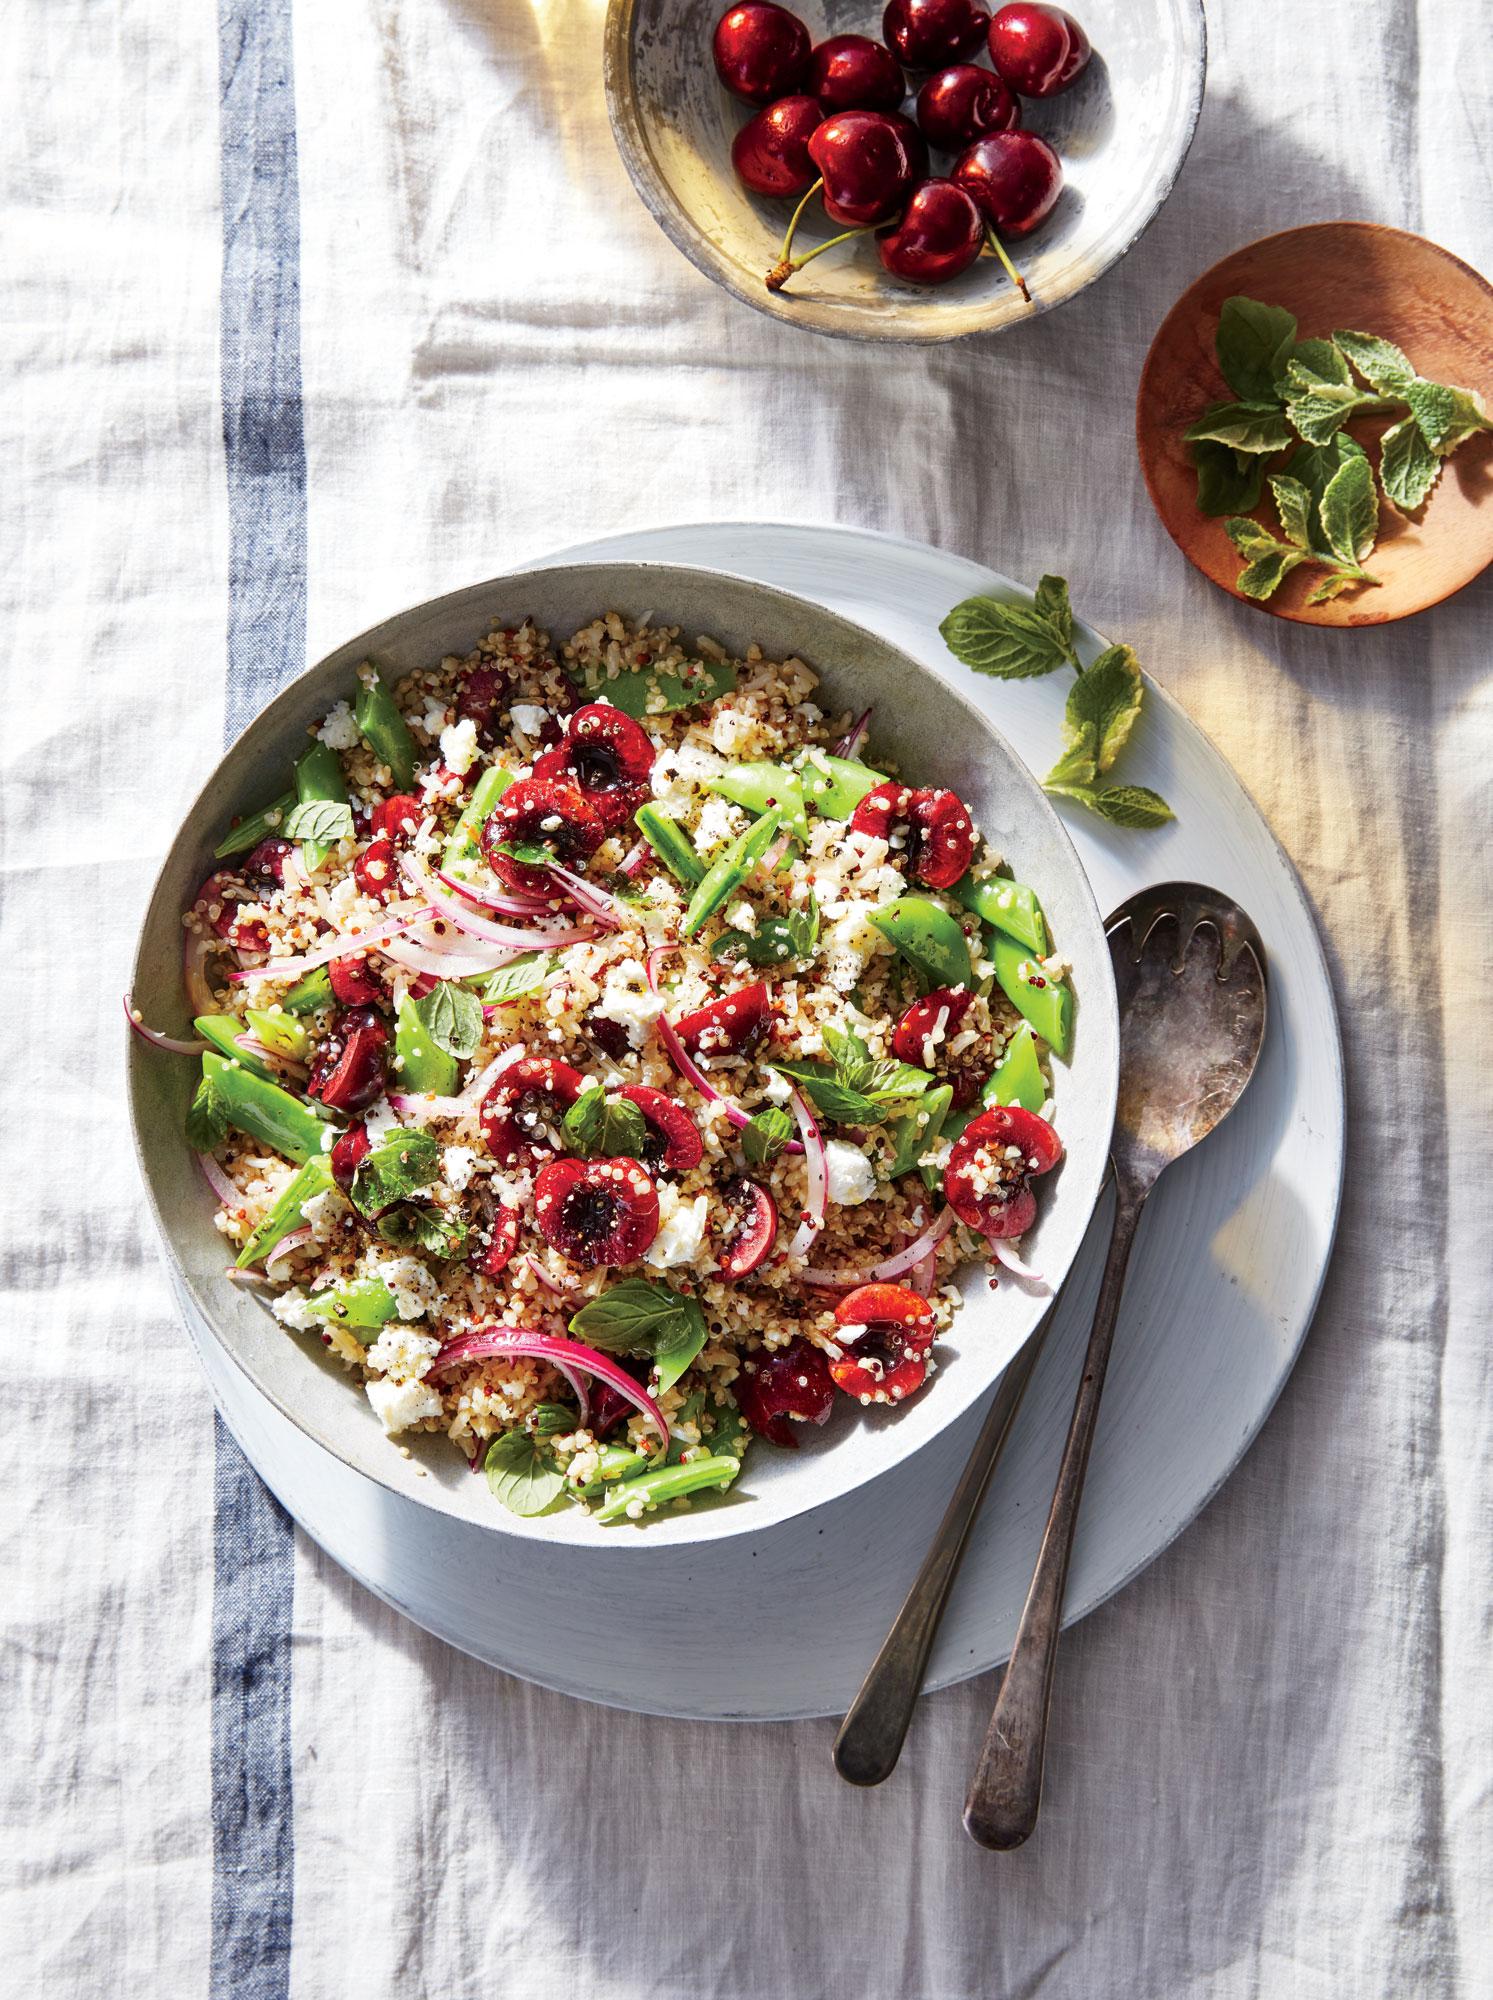 Mixed Grain, Cherry, and Snap Pea Salad